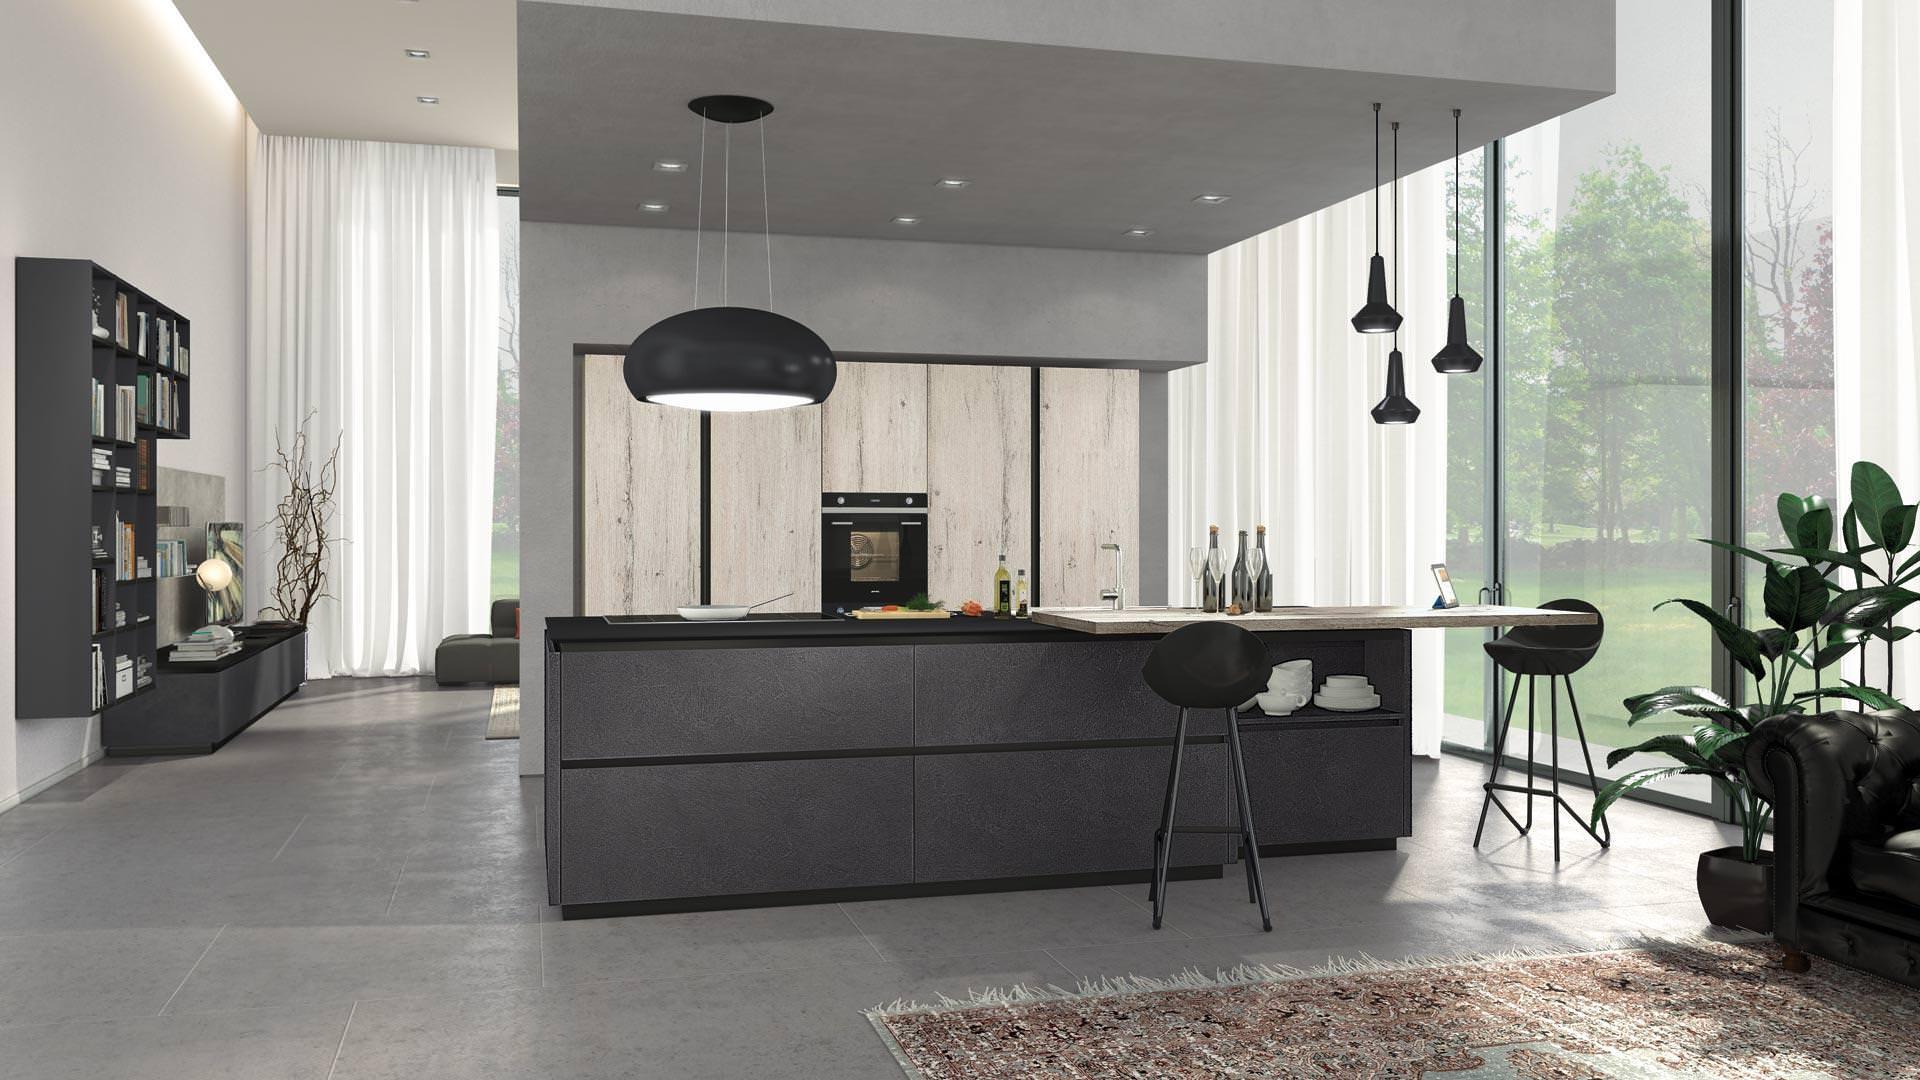 Arredamento casa mobili design  Bolzano  Arredobene